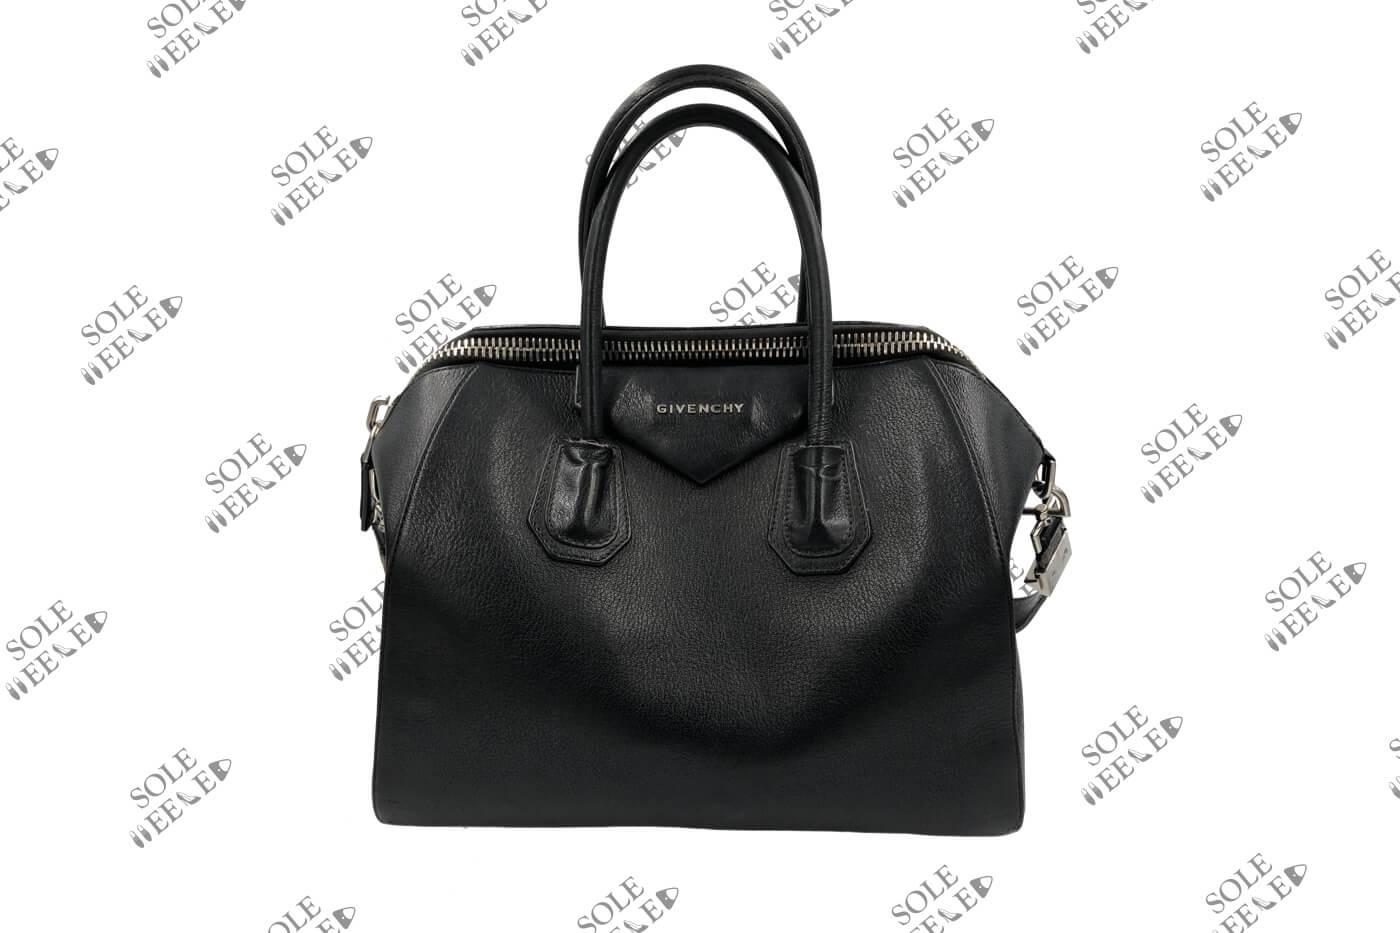 Givenchy Handbag Reshape